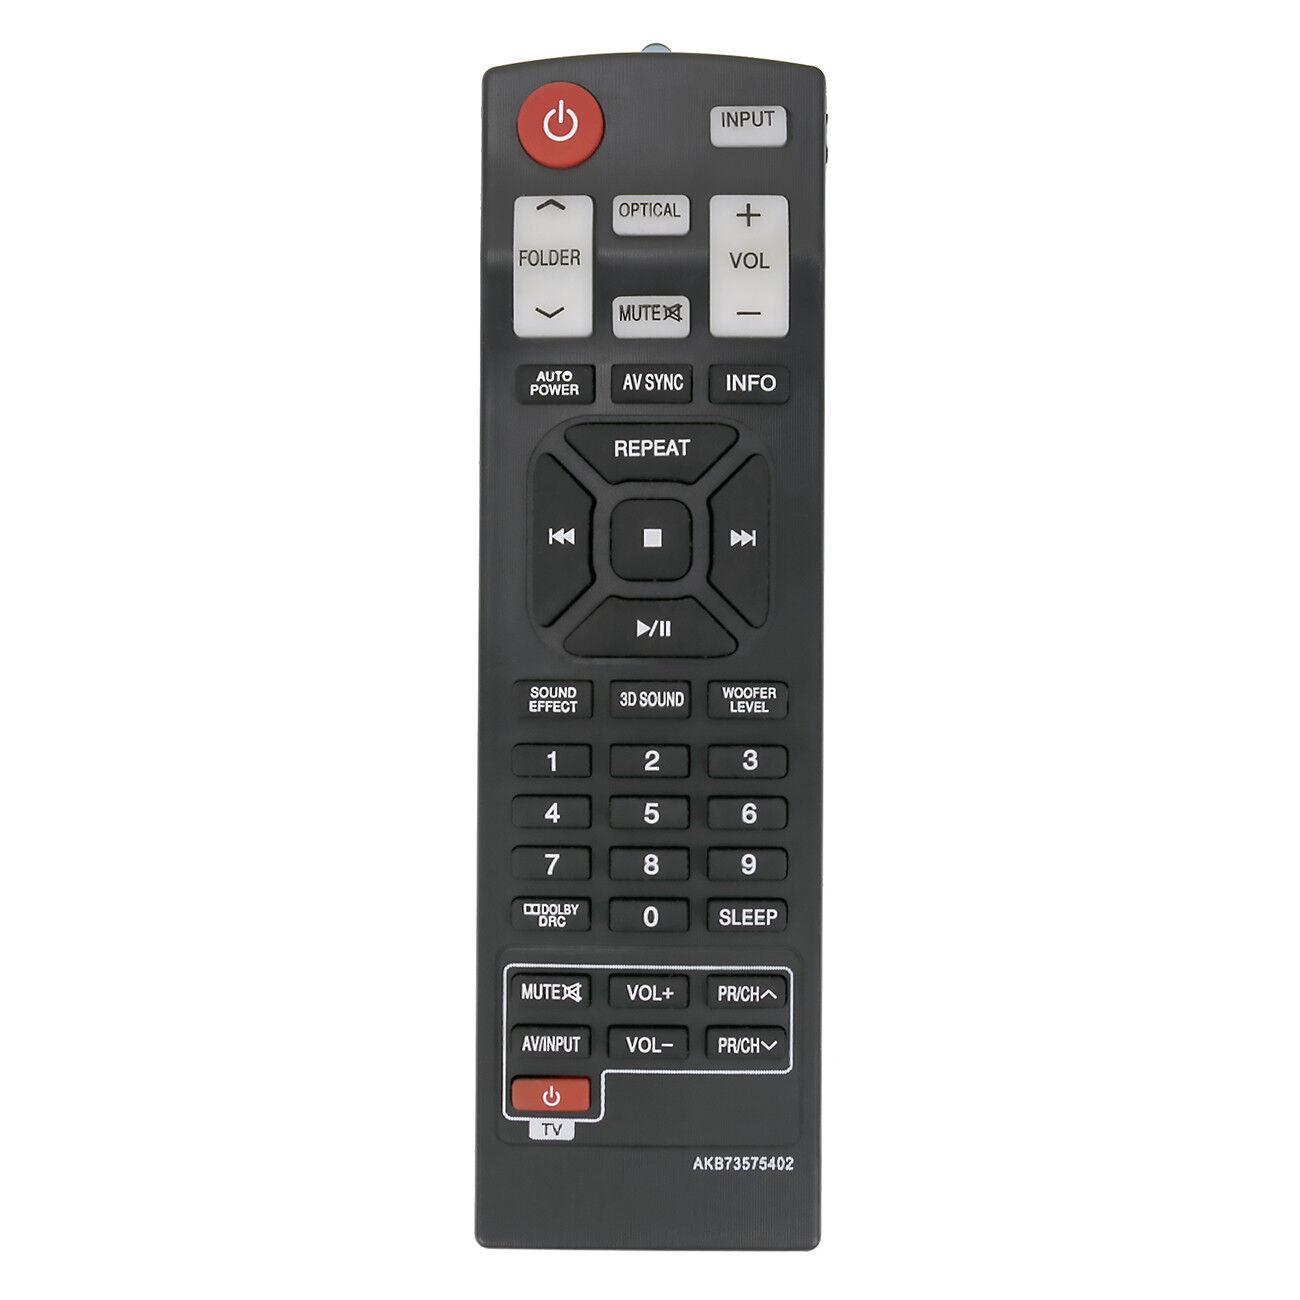 Nuevo control remoto AKB73575402 para LG Soundbar NB3730A NB3531A NB3530A